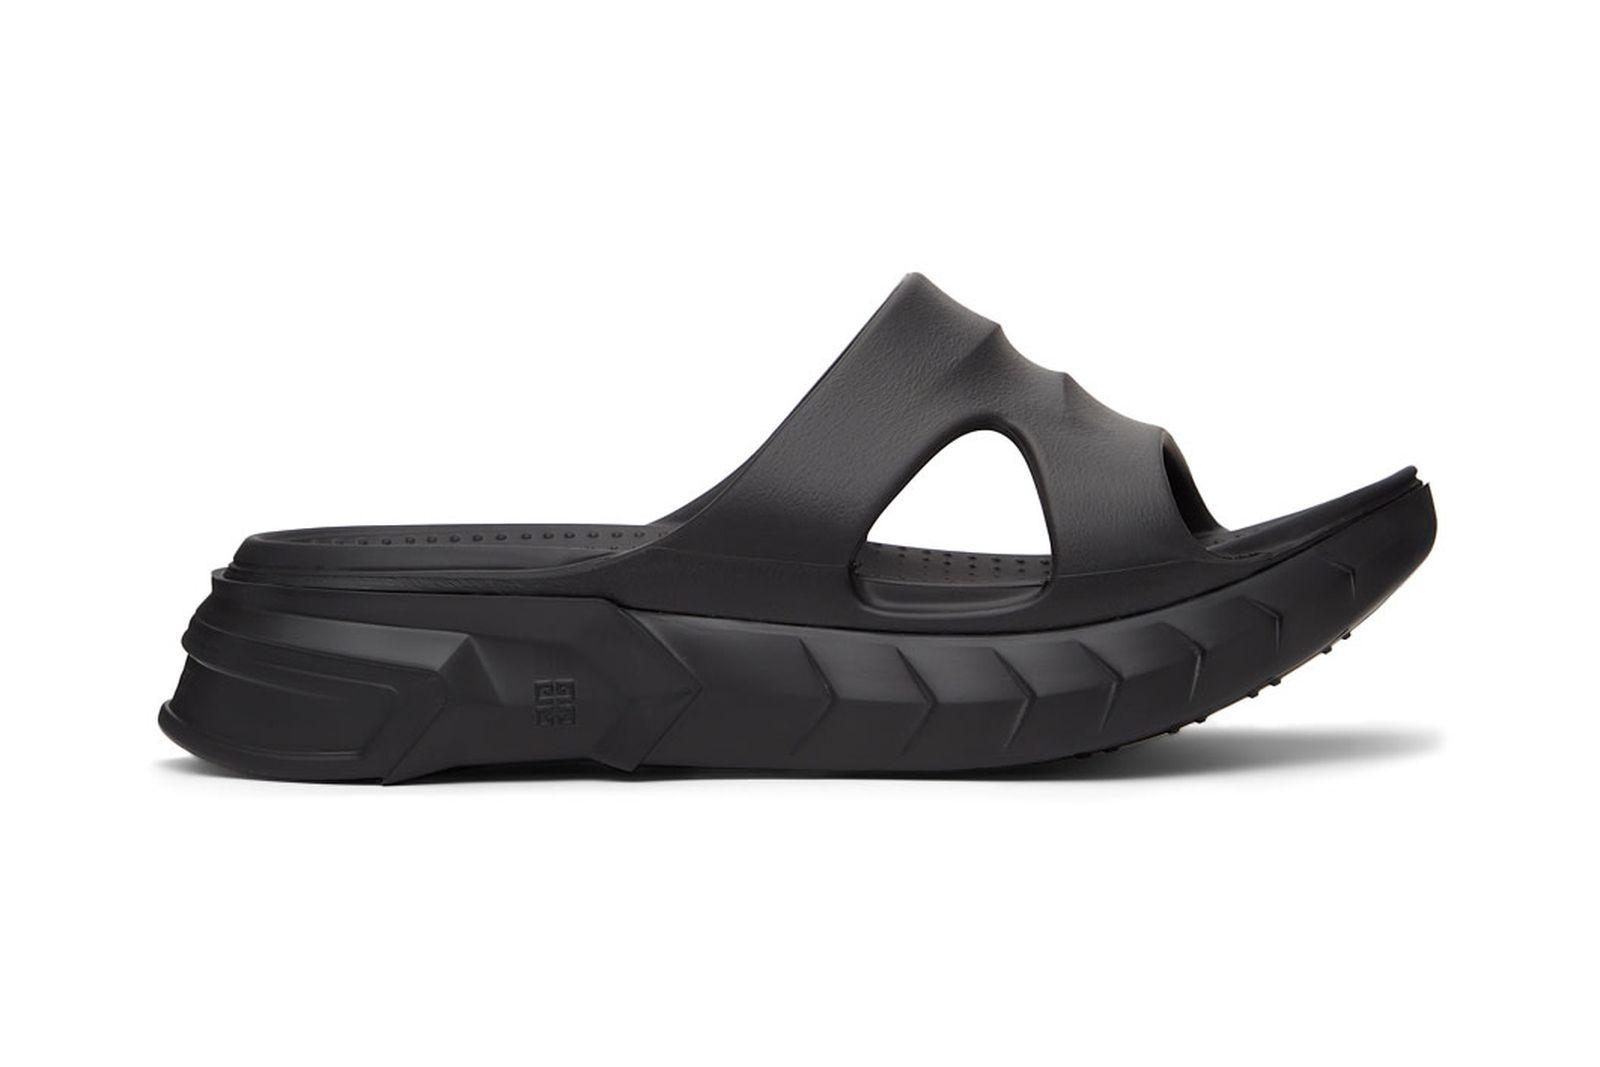 balenciaga-givenchy-molded-sandals- (4)